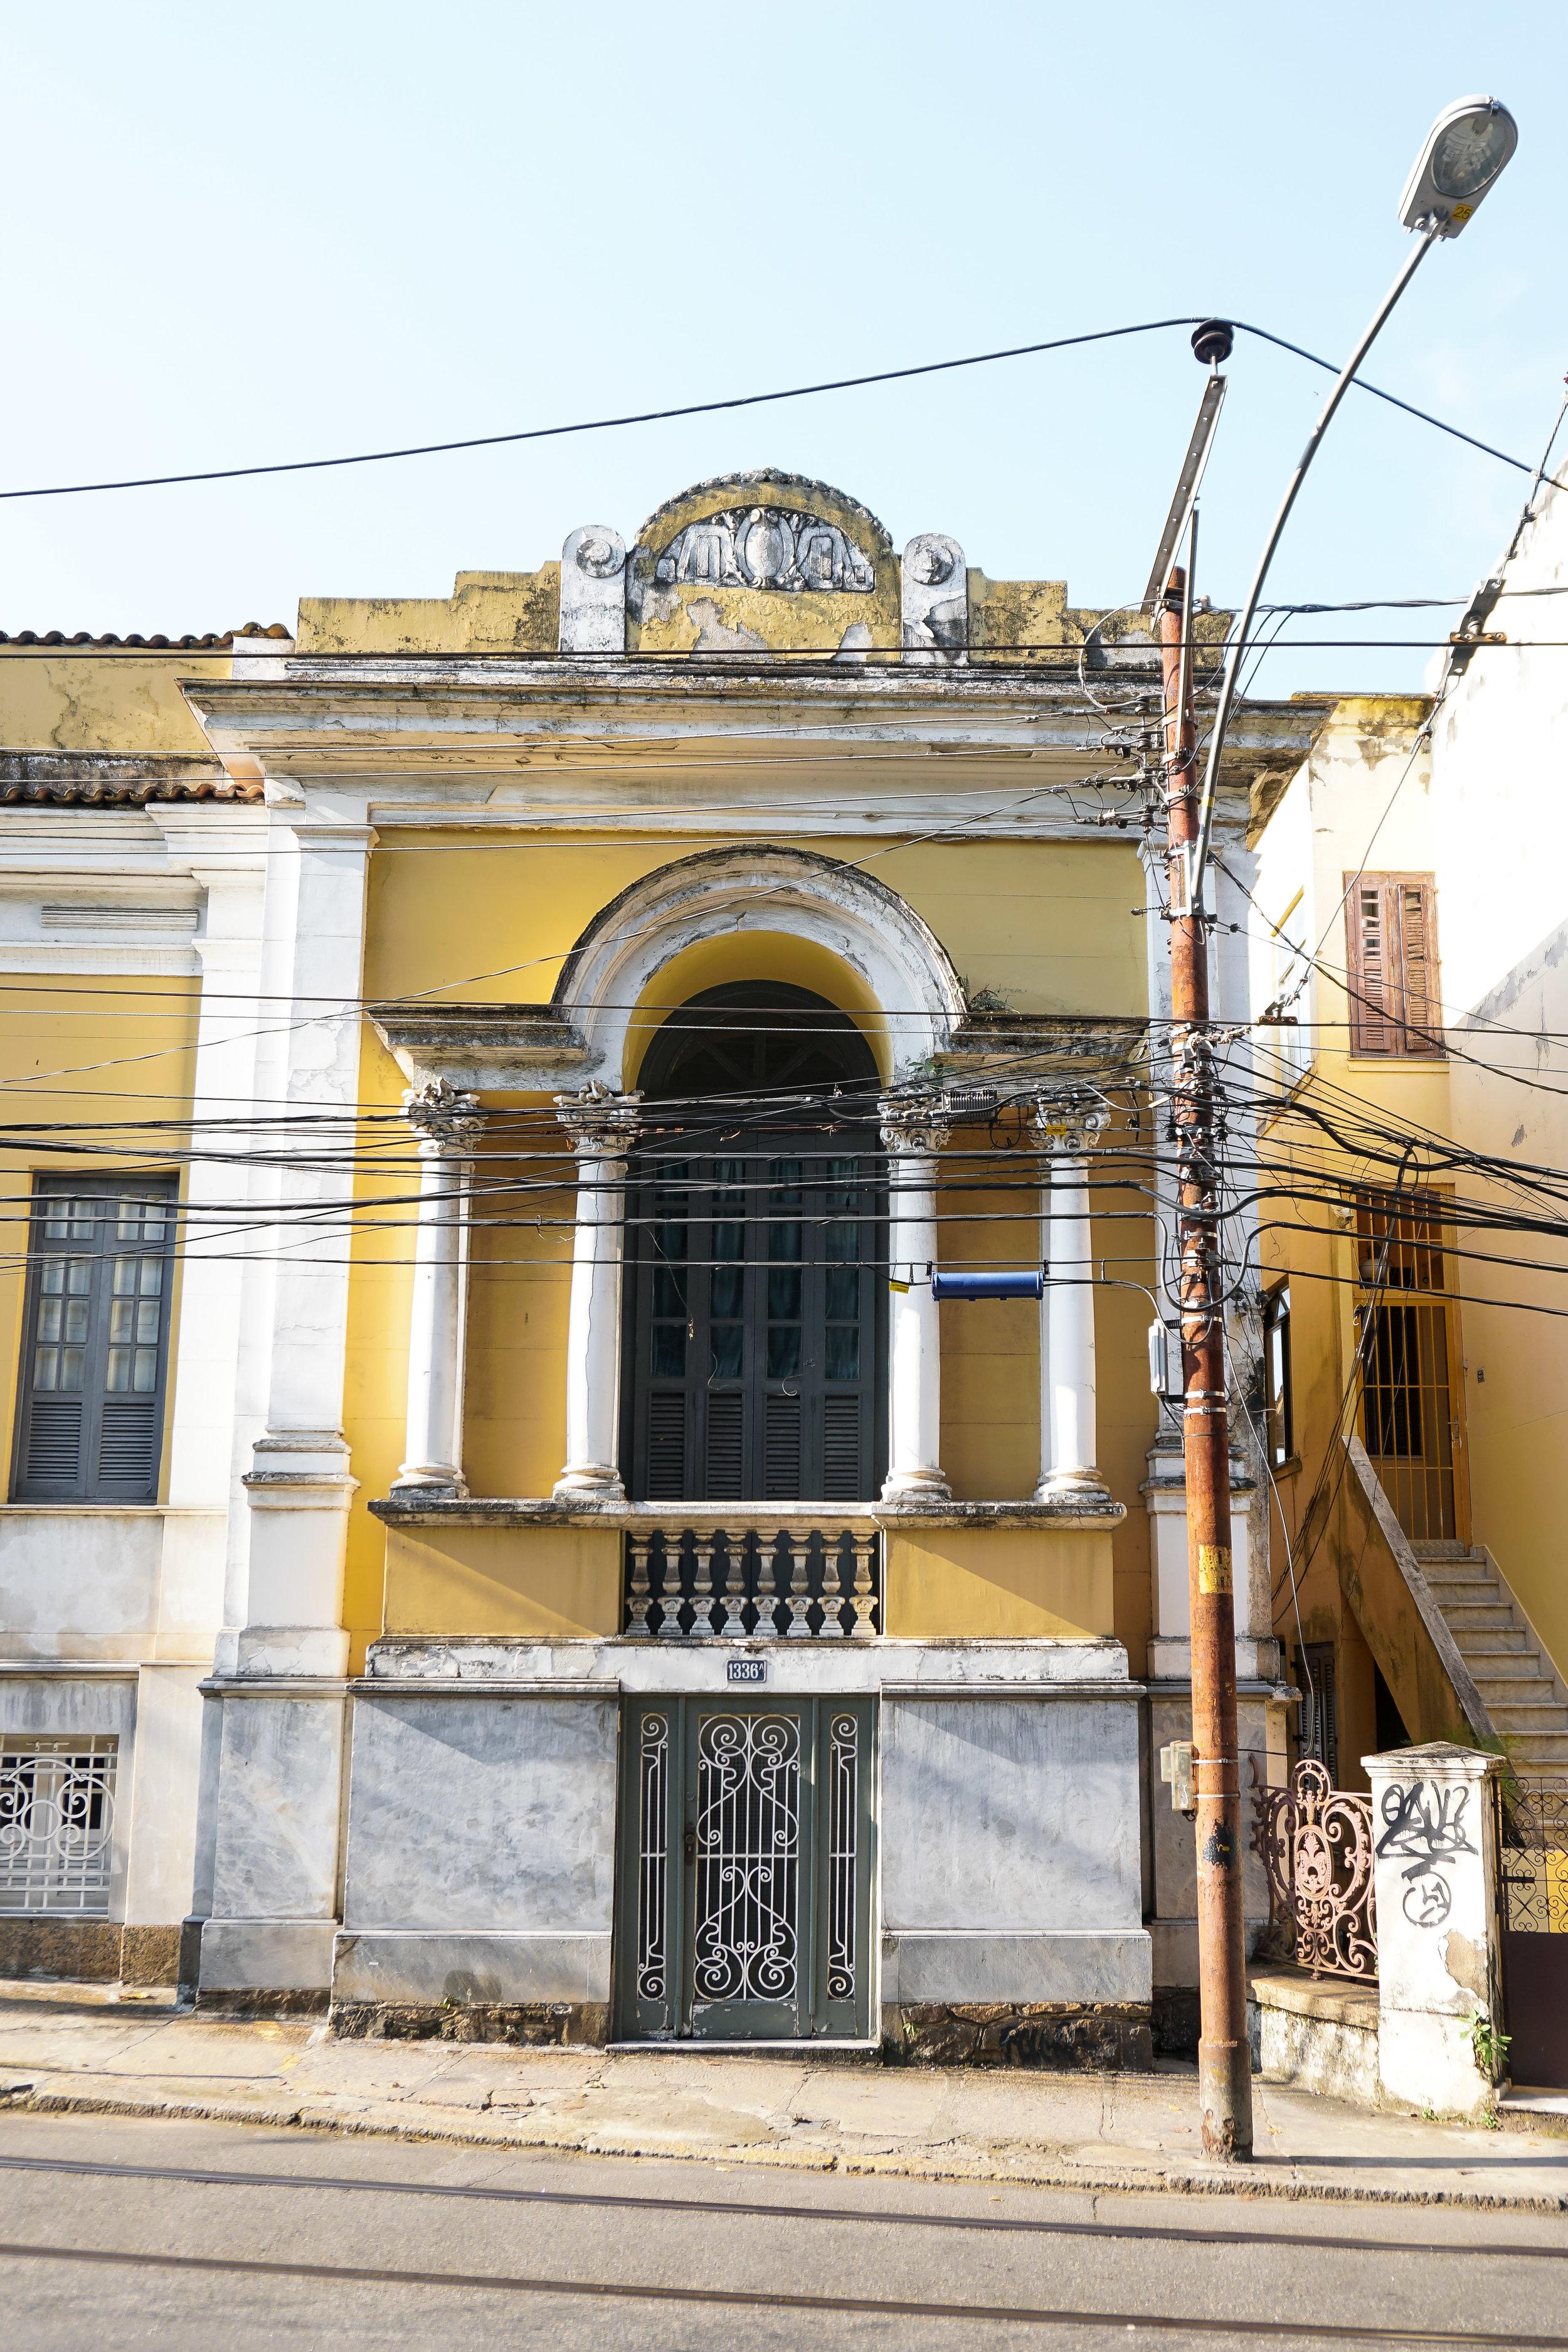 curio.trips.brazil.rio.de.janeiro.yellow.house.portrait.jpg